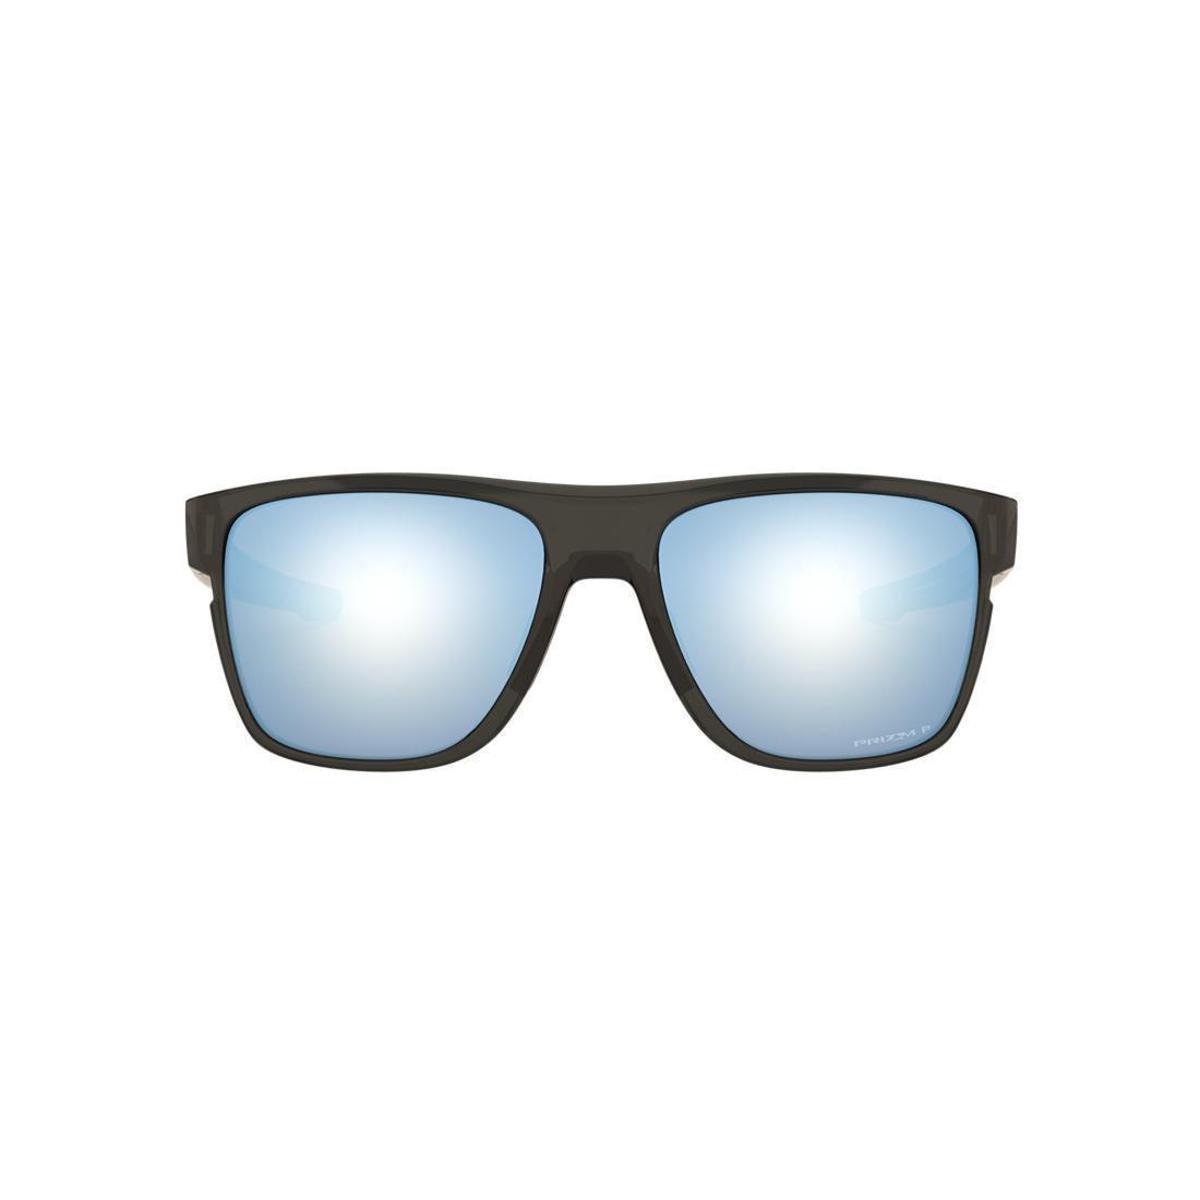 5cb22151b Óculos Oakley de Sol Crossrange Xl Masculino   Zattini